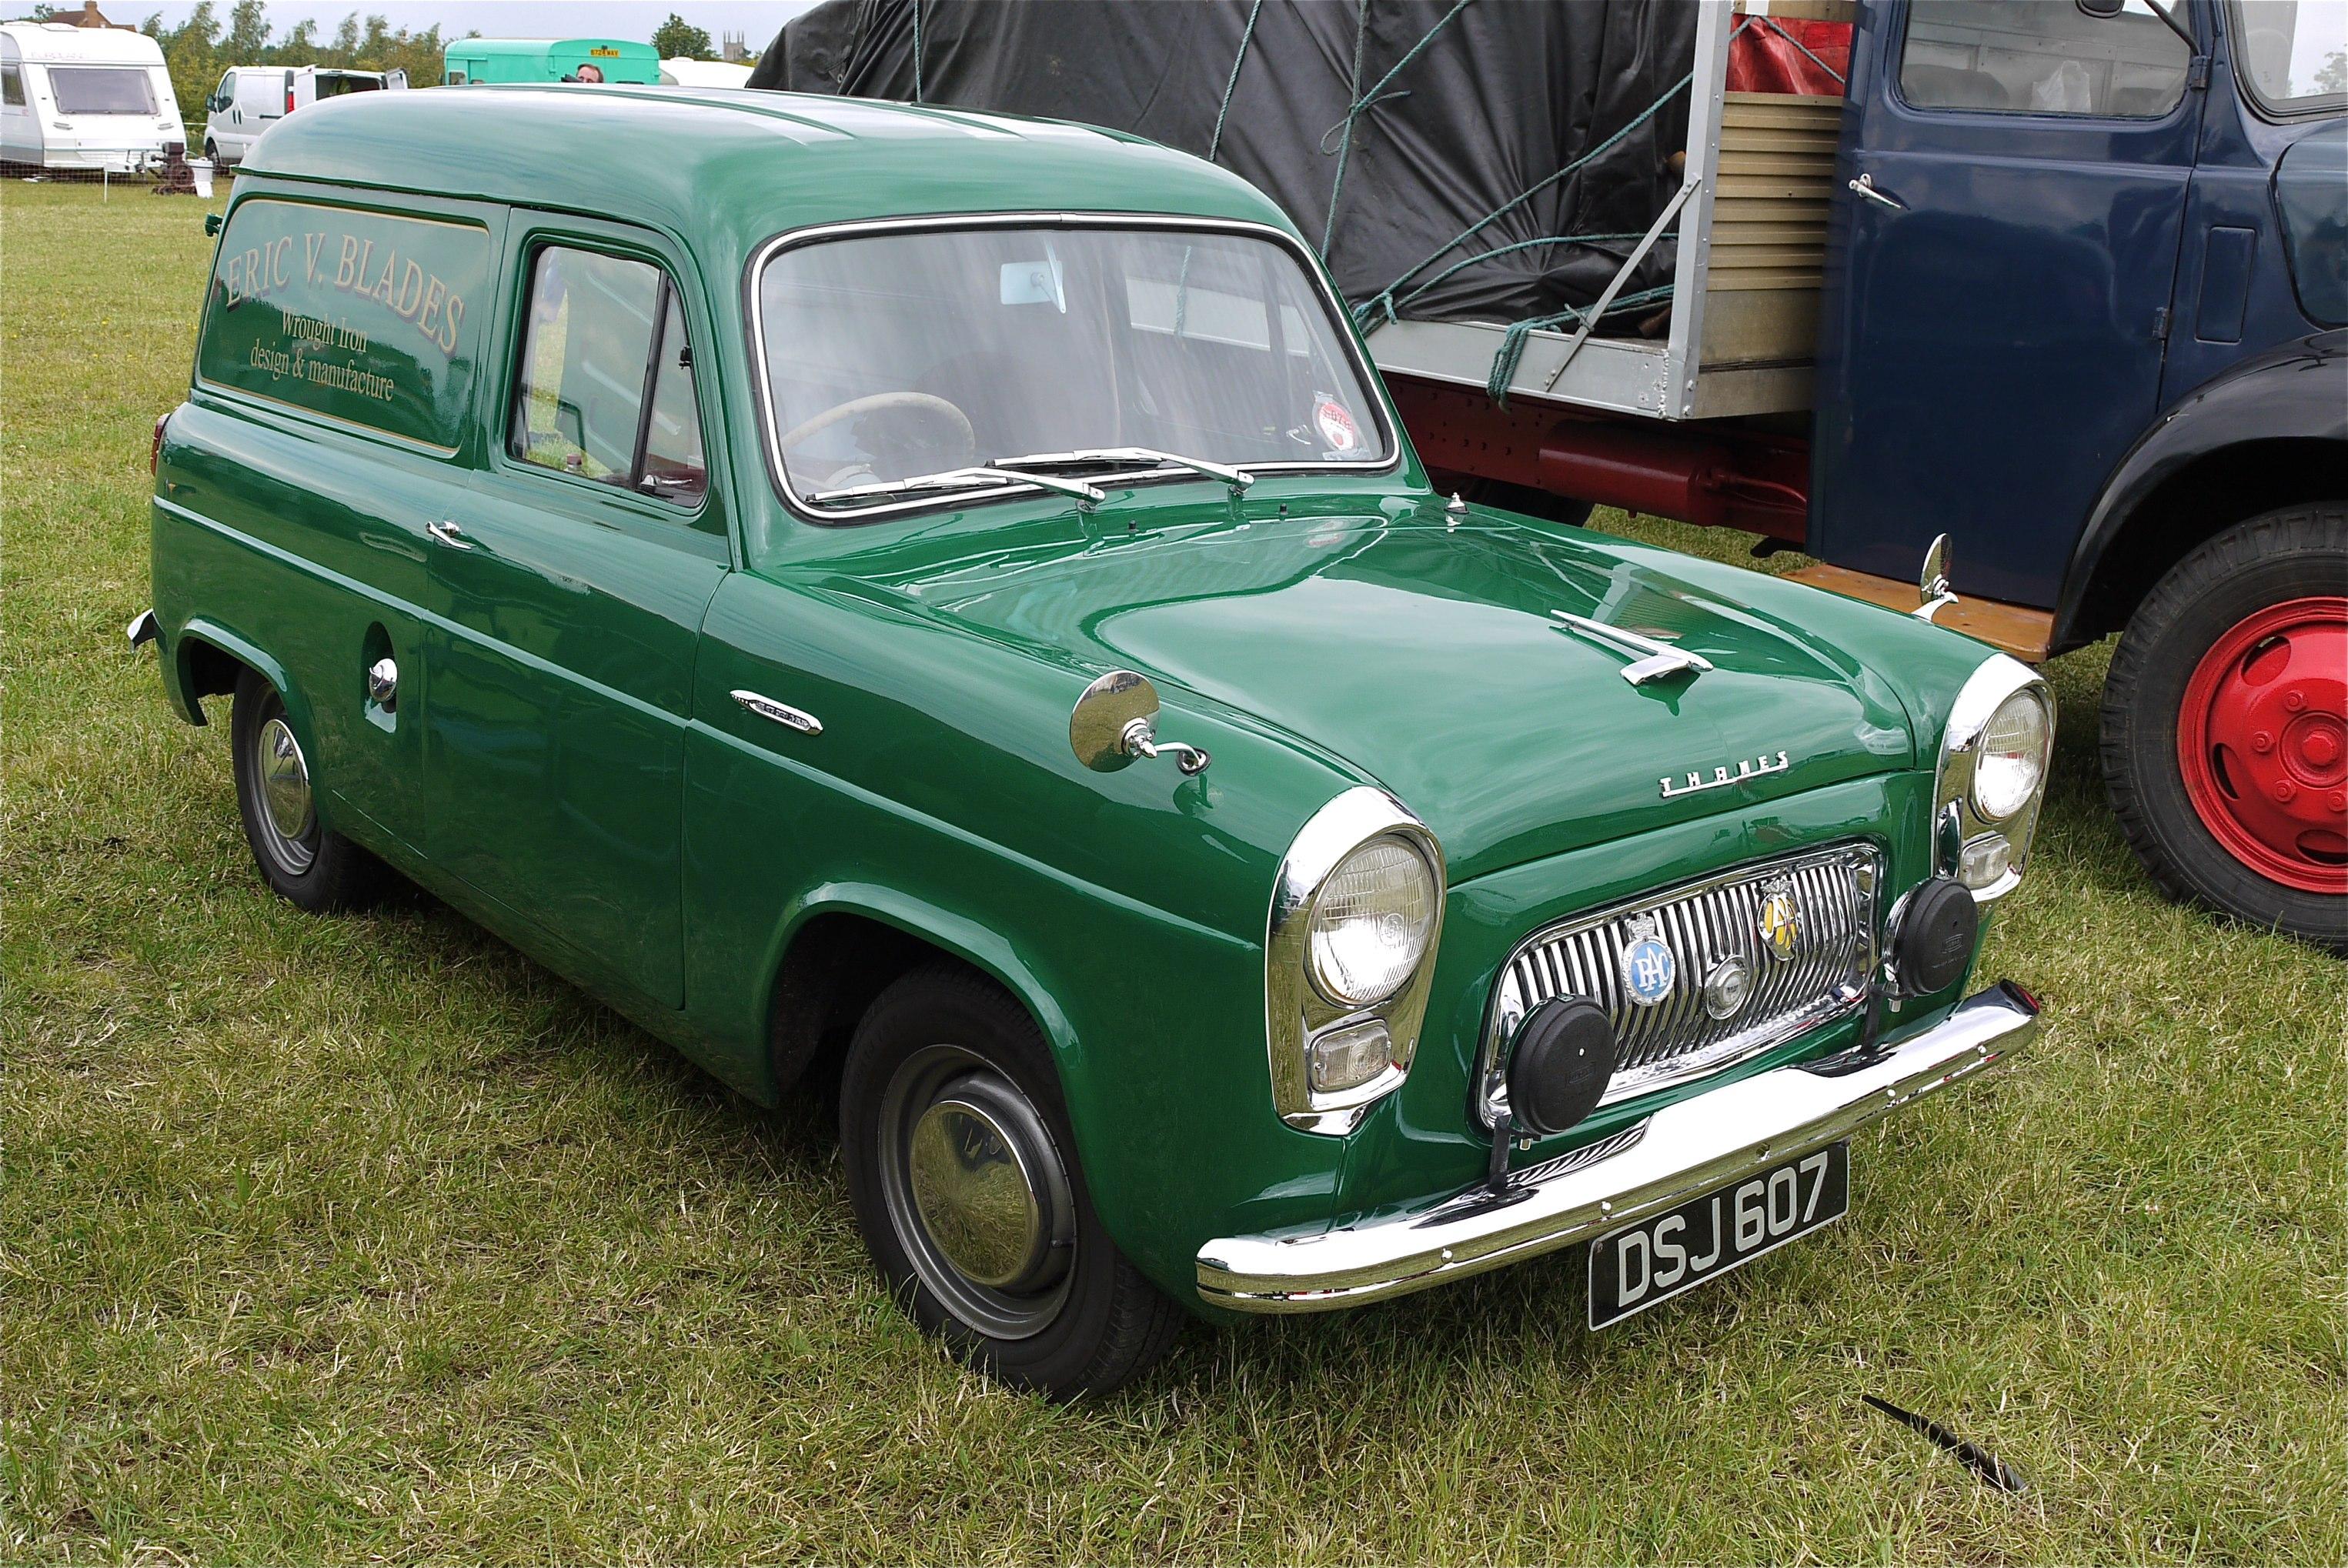 File:Ford Thames Van 1956 - Flickr - mick - Lumix.jpg